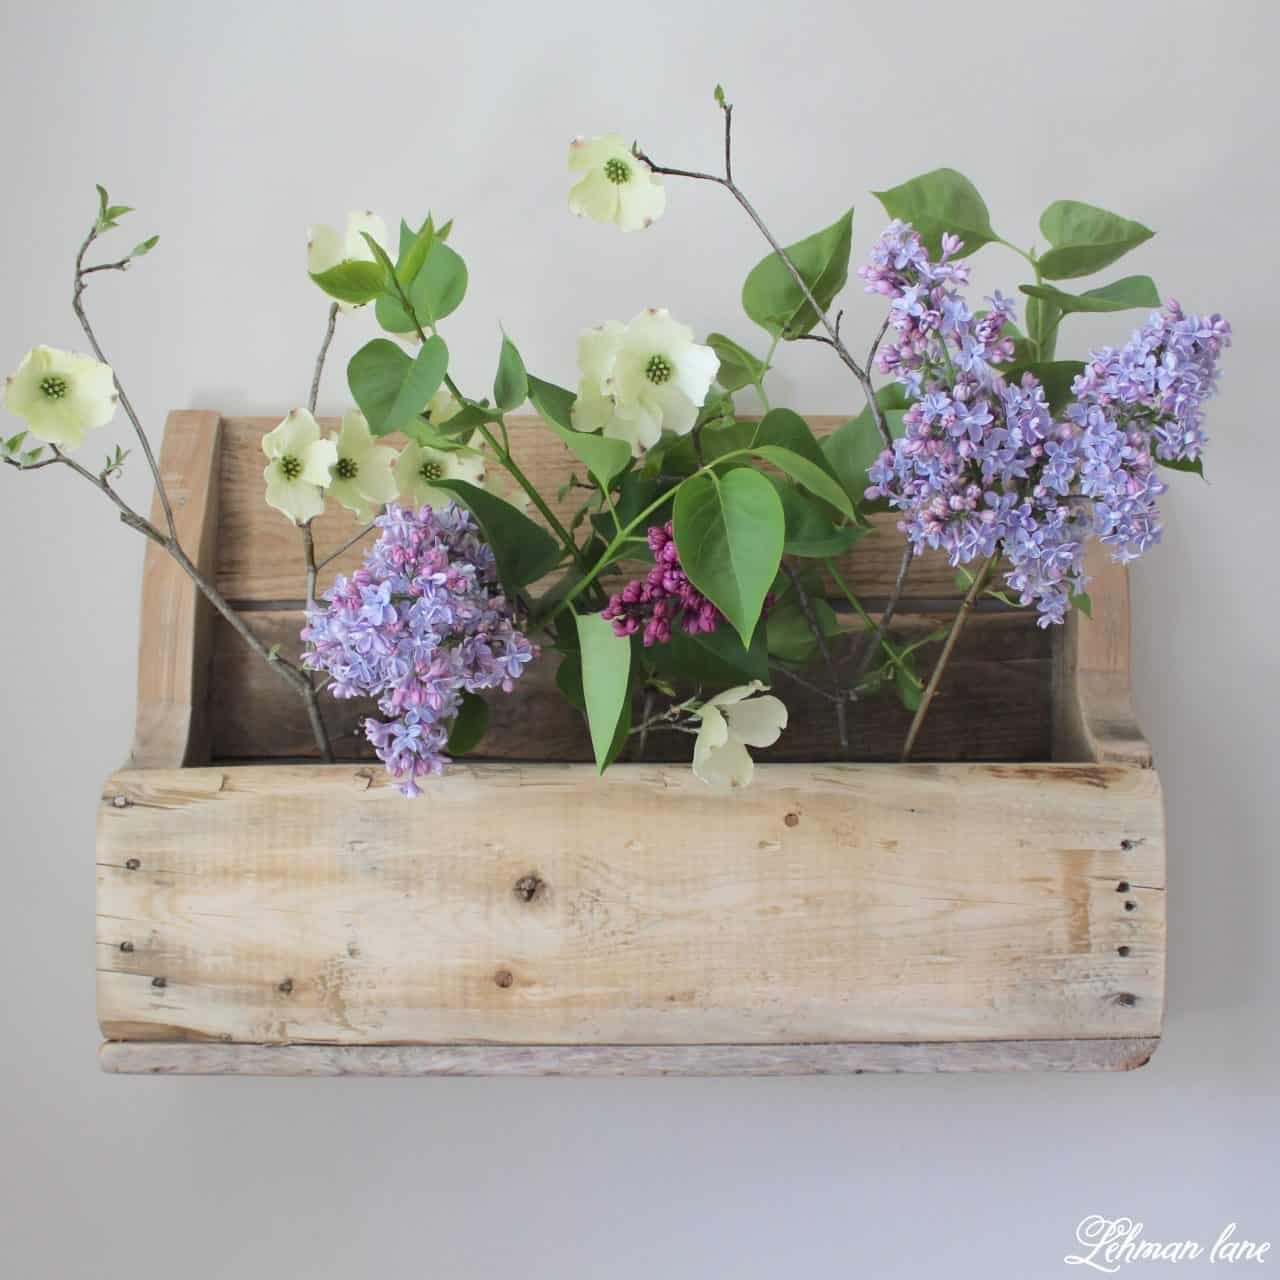 Diy wooden pallet shelf for flowers